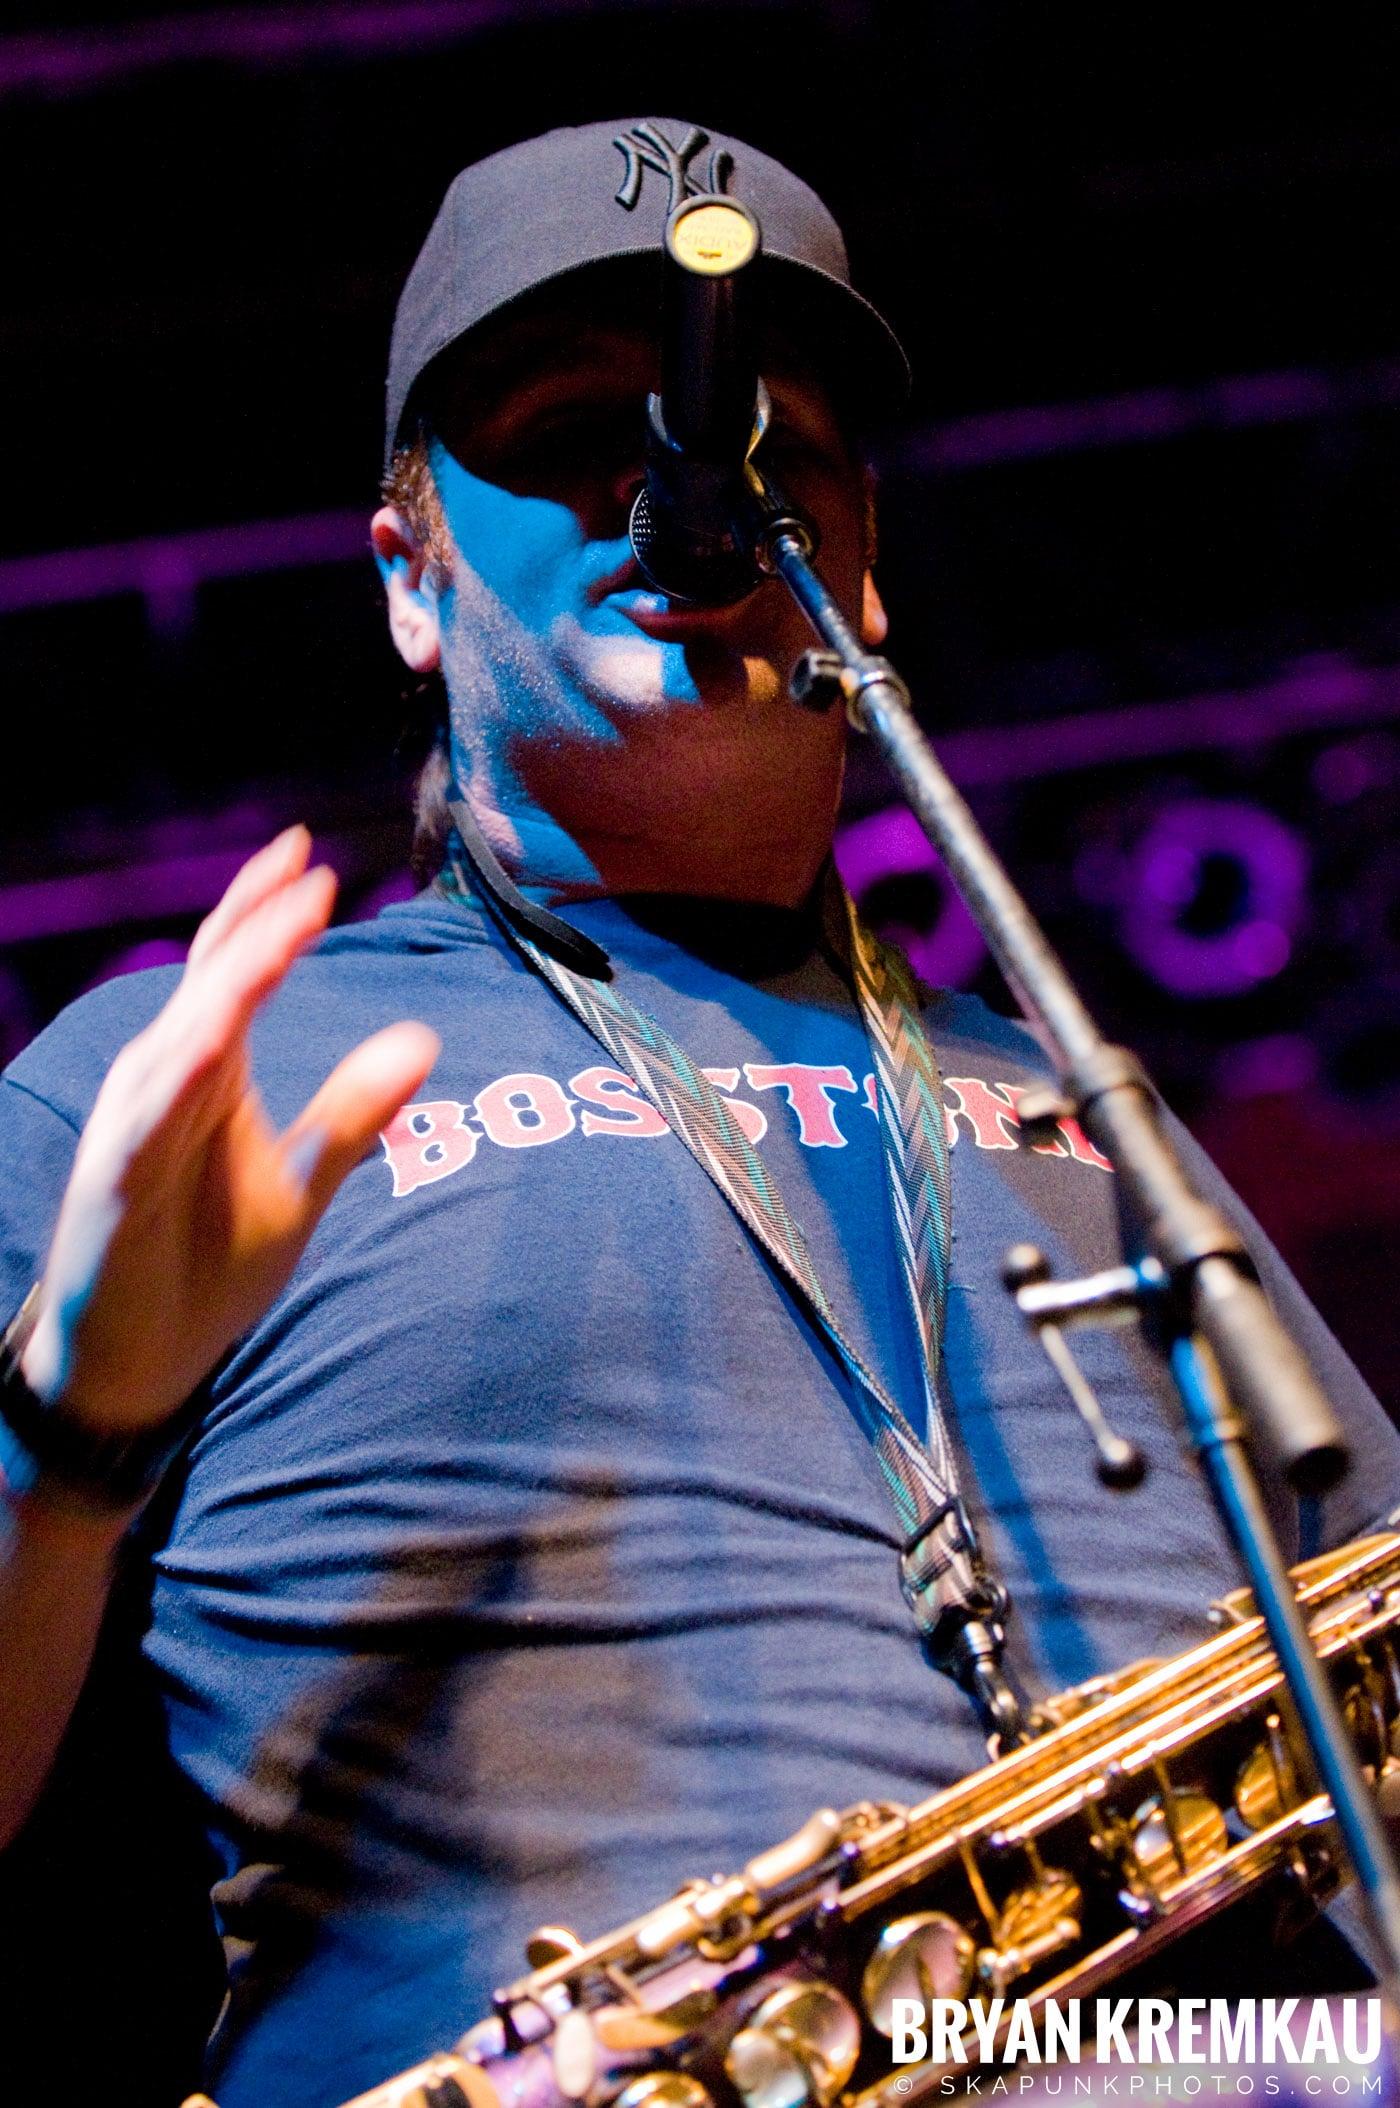 Less Than Jake @ Roseland Ballroom, NYC - 6.26.08 (10)